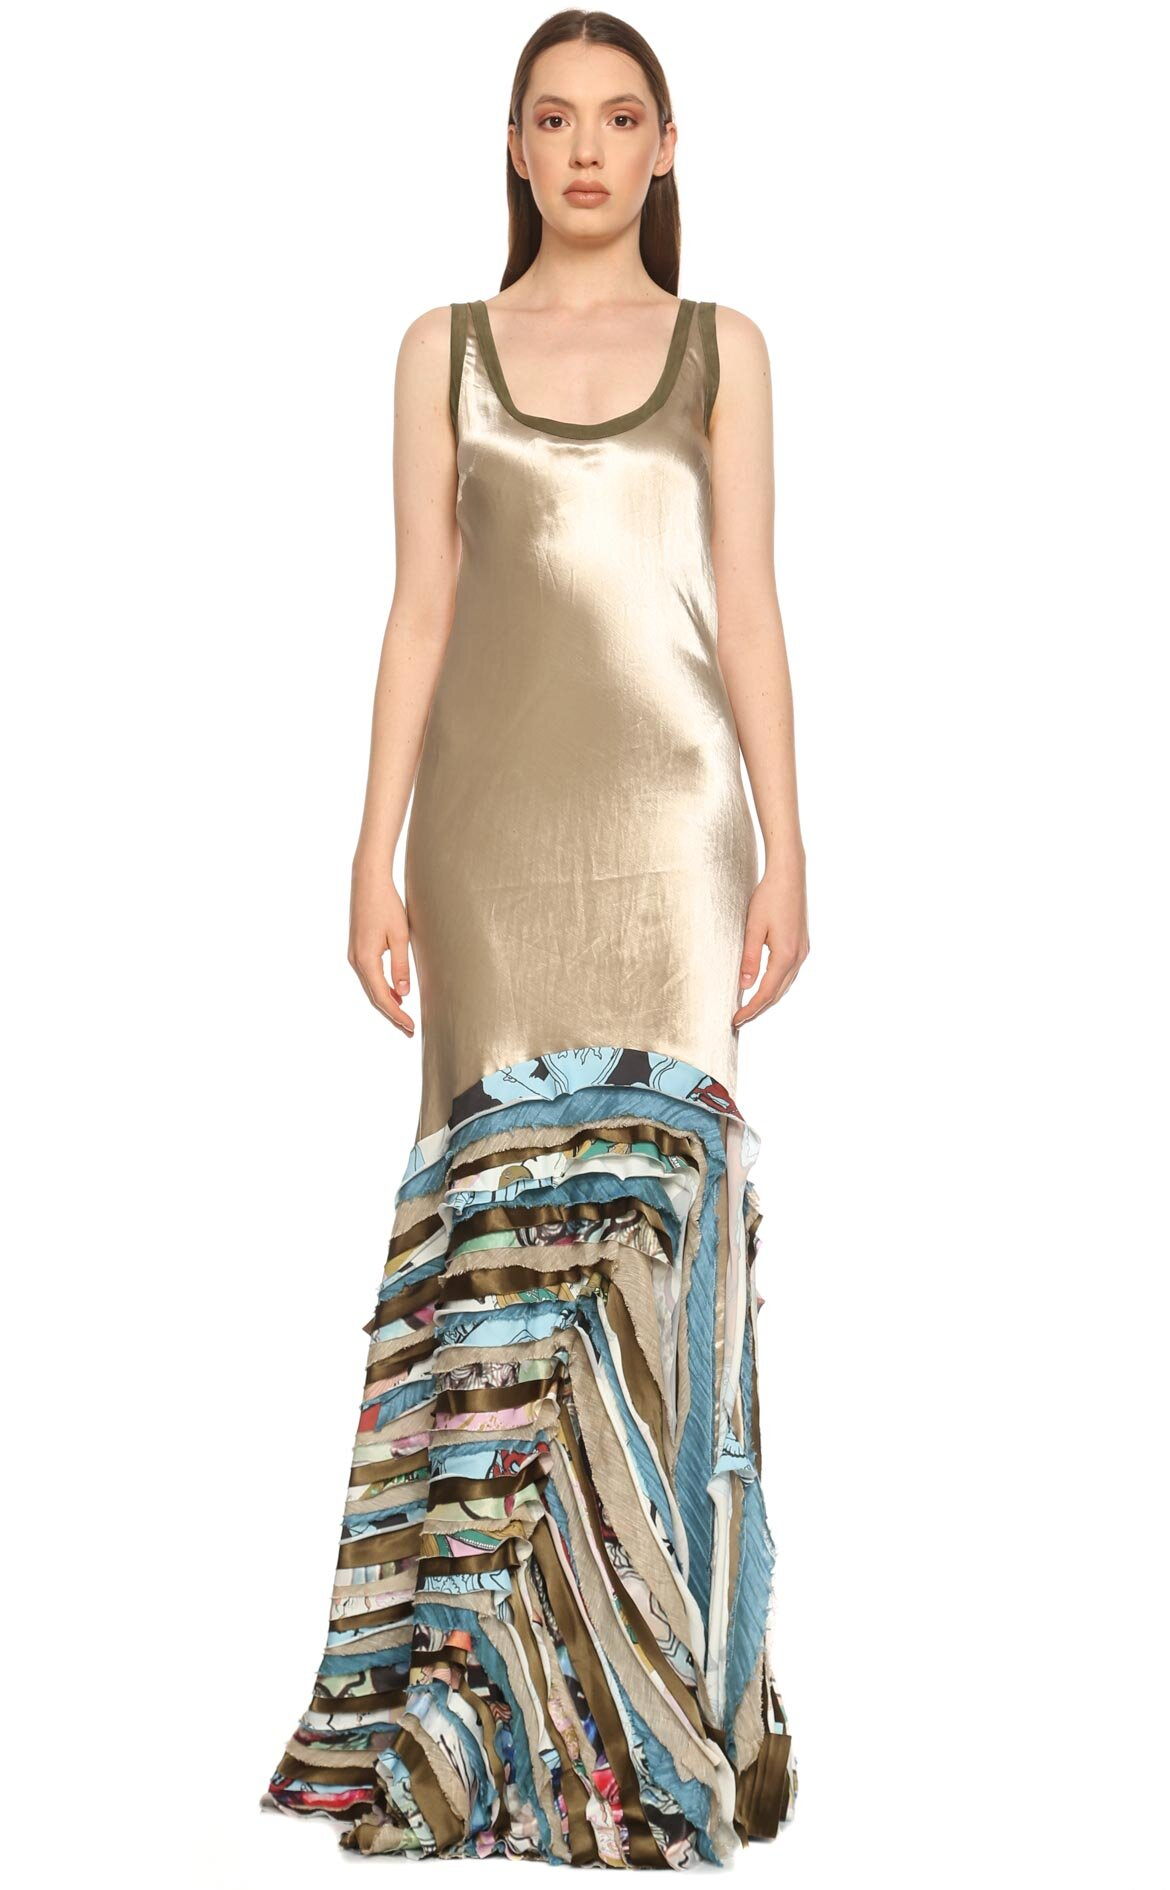 Bashaques-Bashaques Elbise